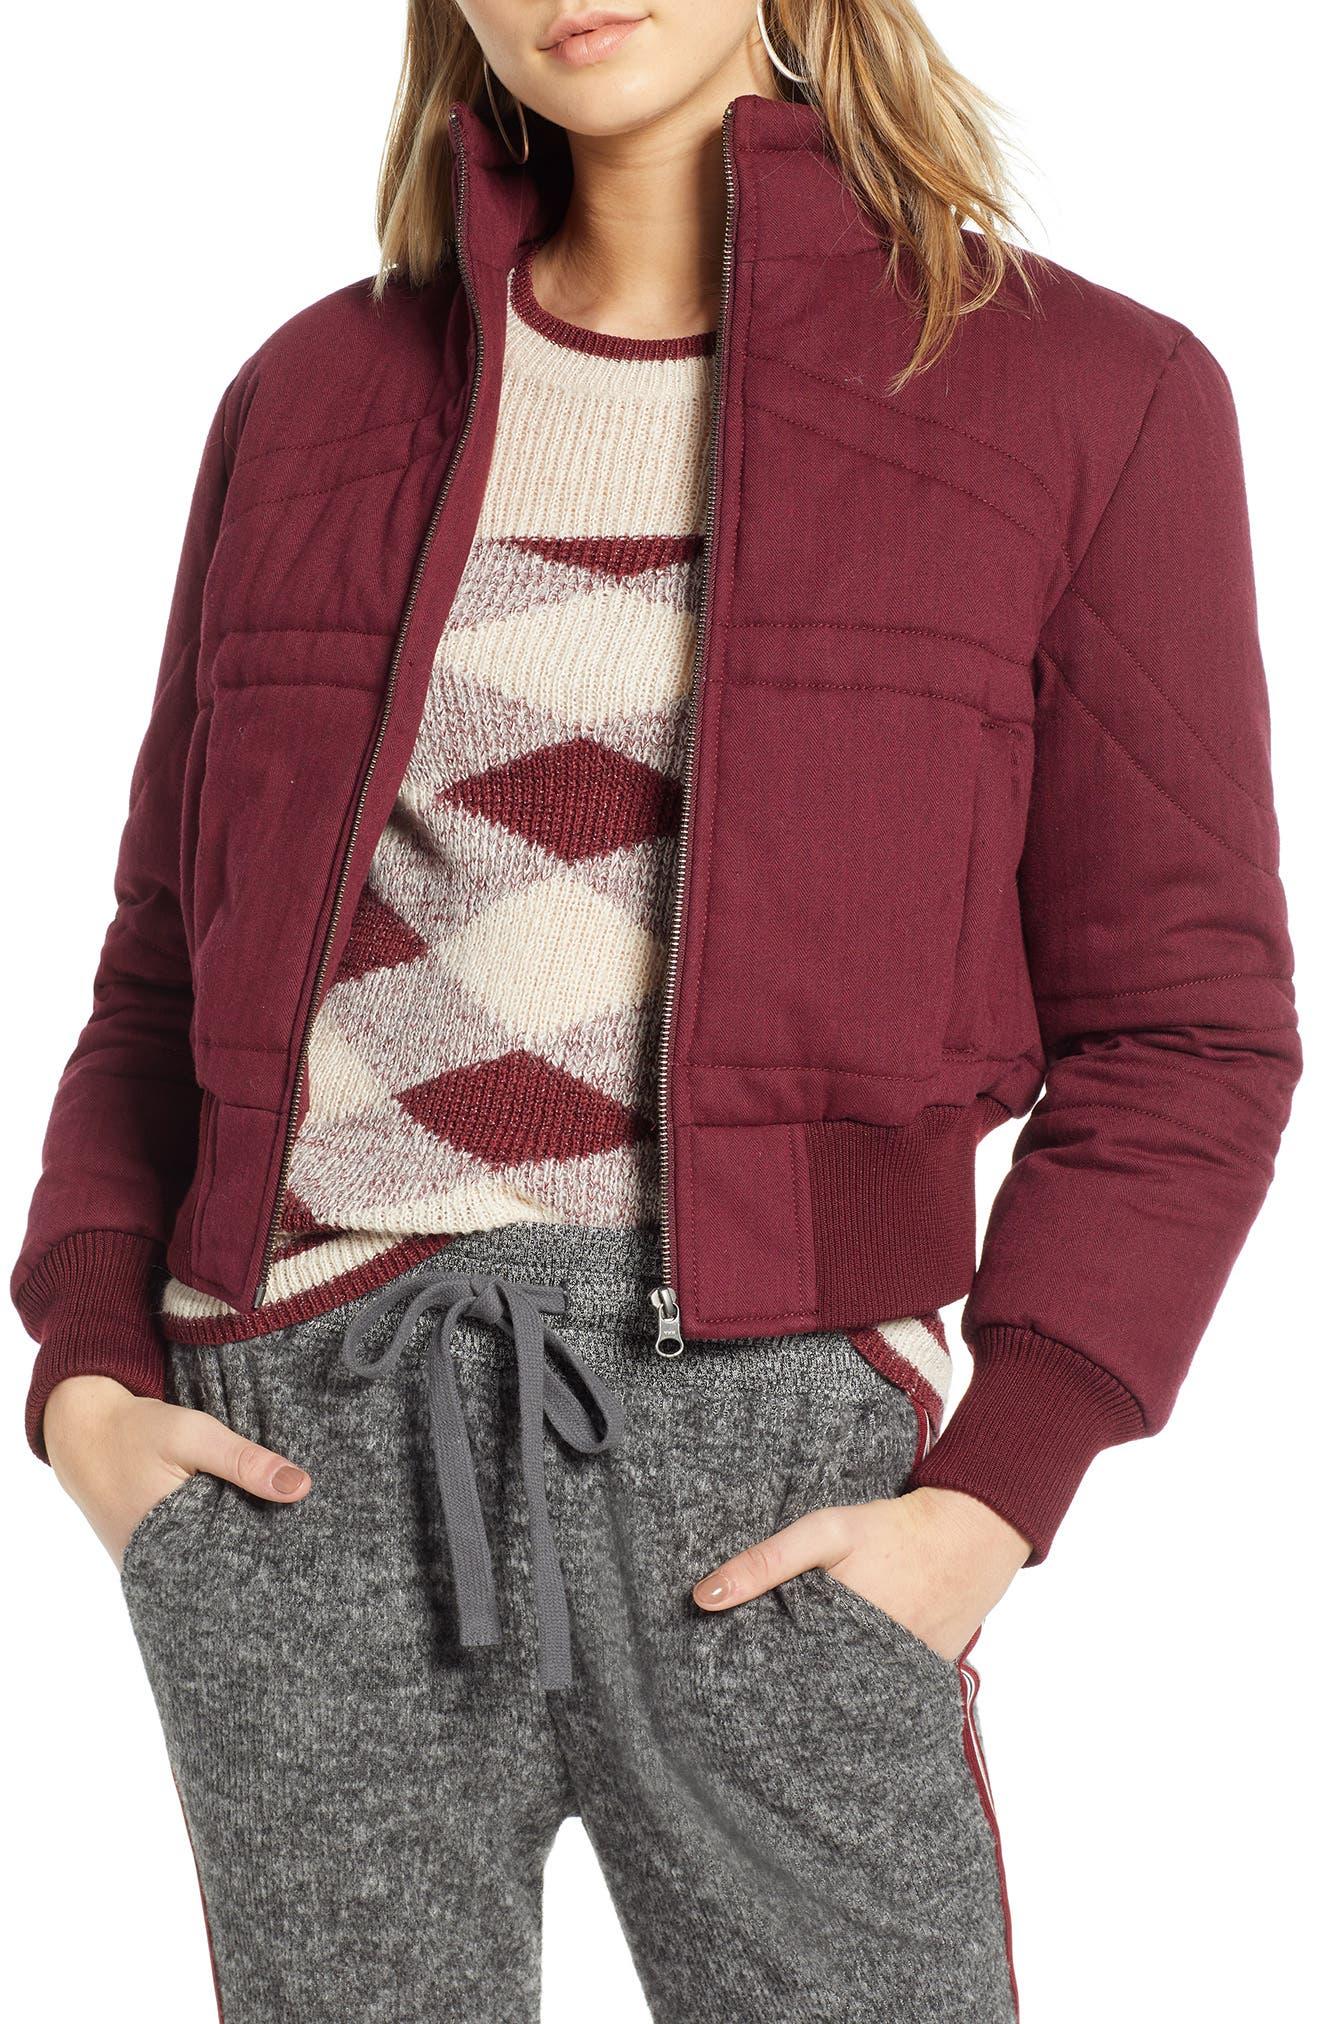 TREASURE & BOND Flannel Crop Puffer Jacket, Main, color, RED TANNIN HEATHER